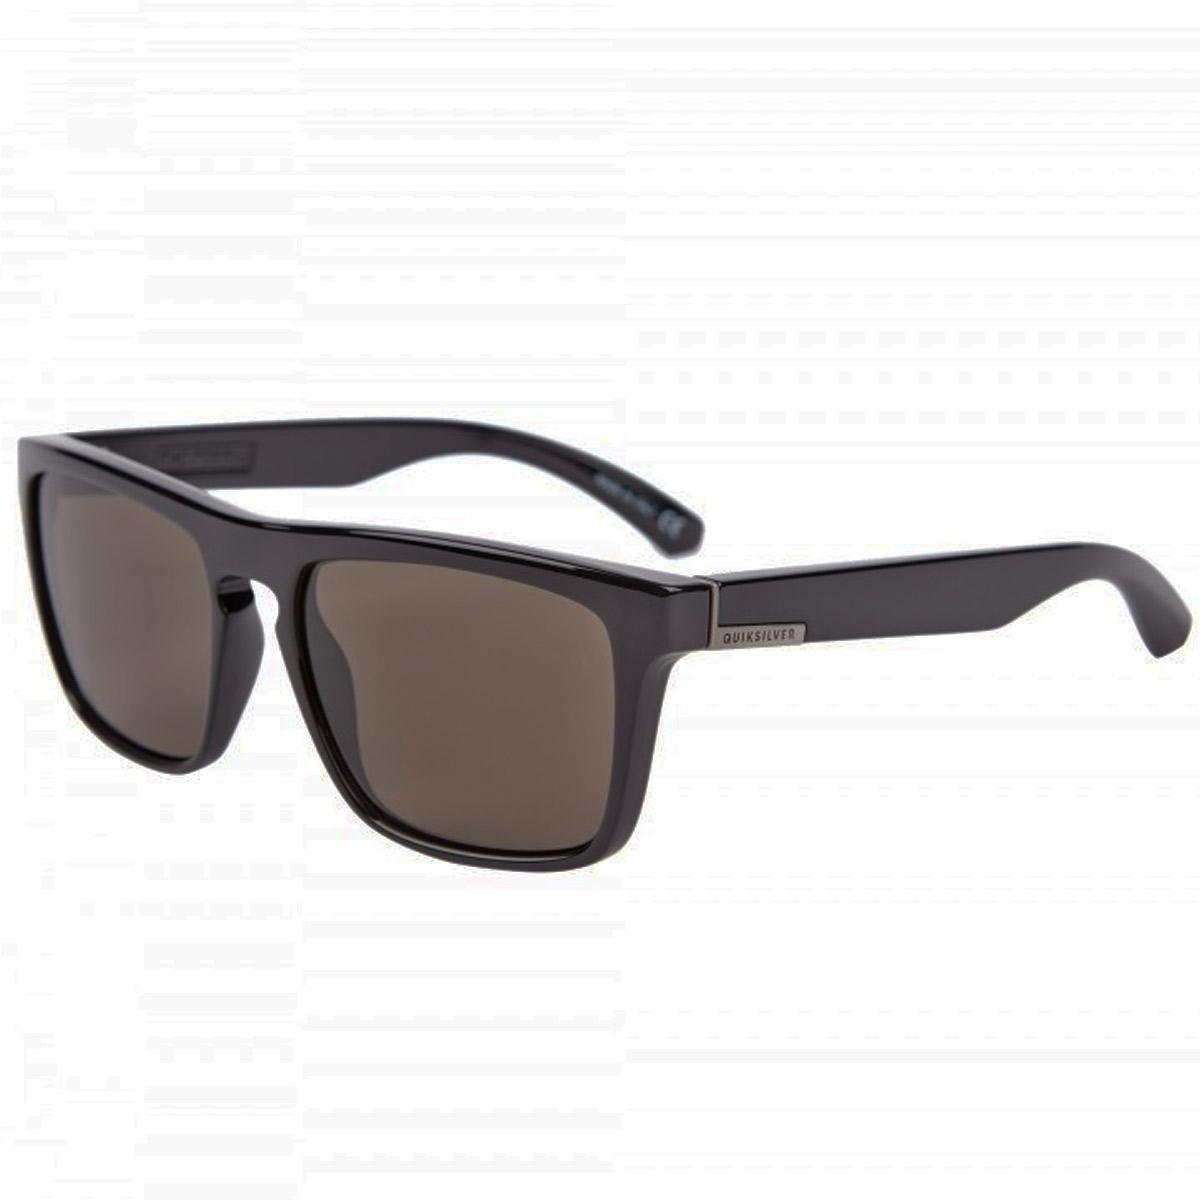 2a178f9abcf12 Óculos Quiksilver The Ferris - Compre Agora   Netshoes